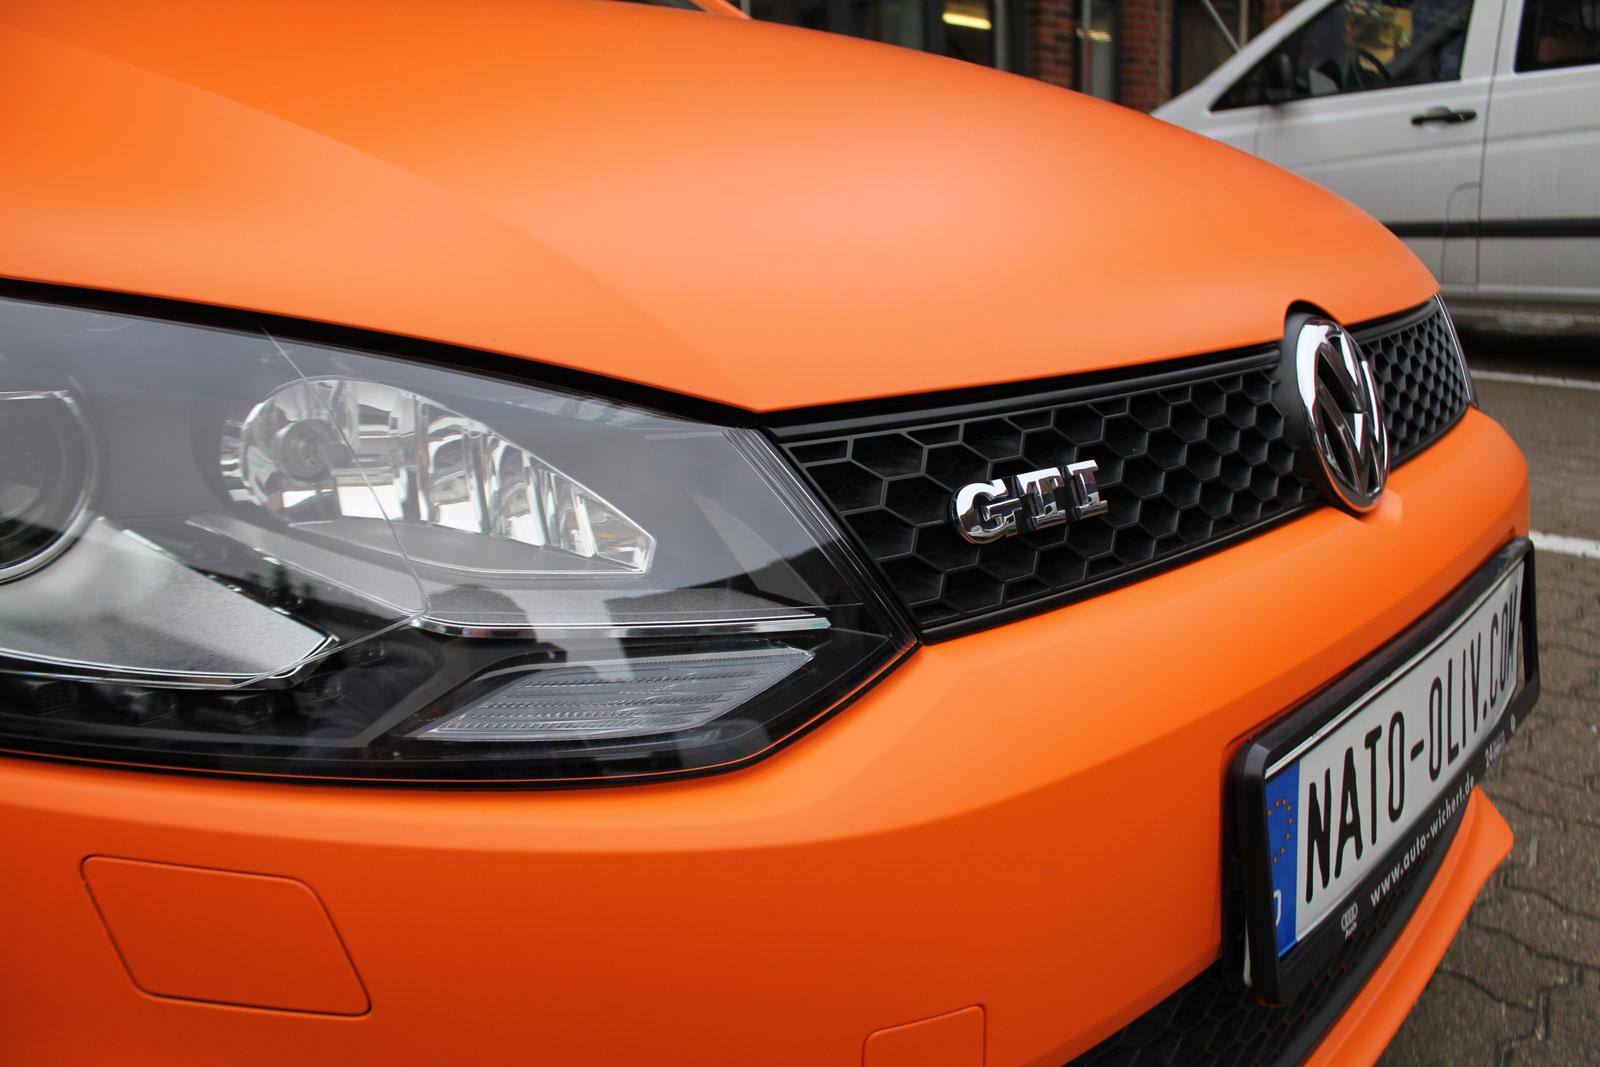 VW_Polo_GTI_Folierung_Orange_Matt_20